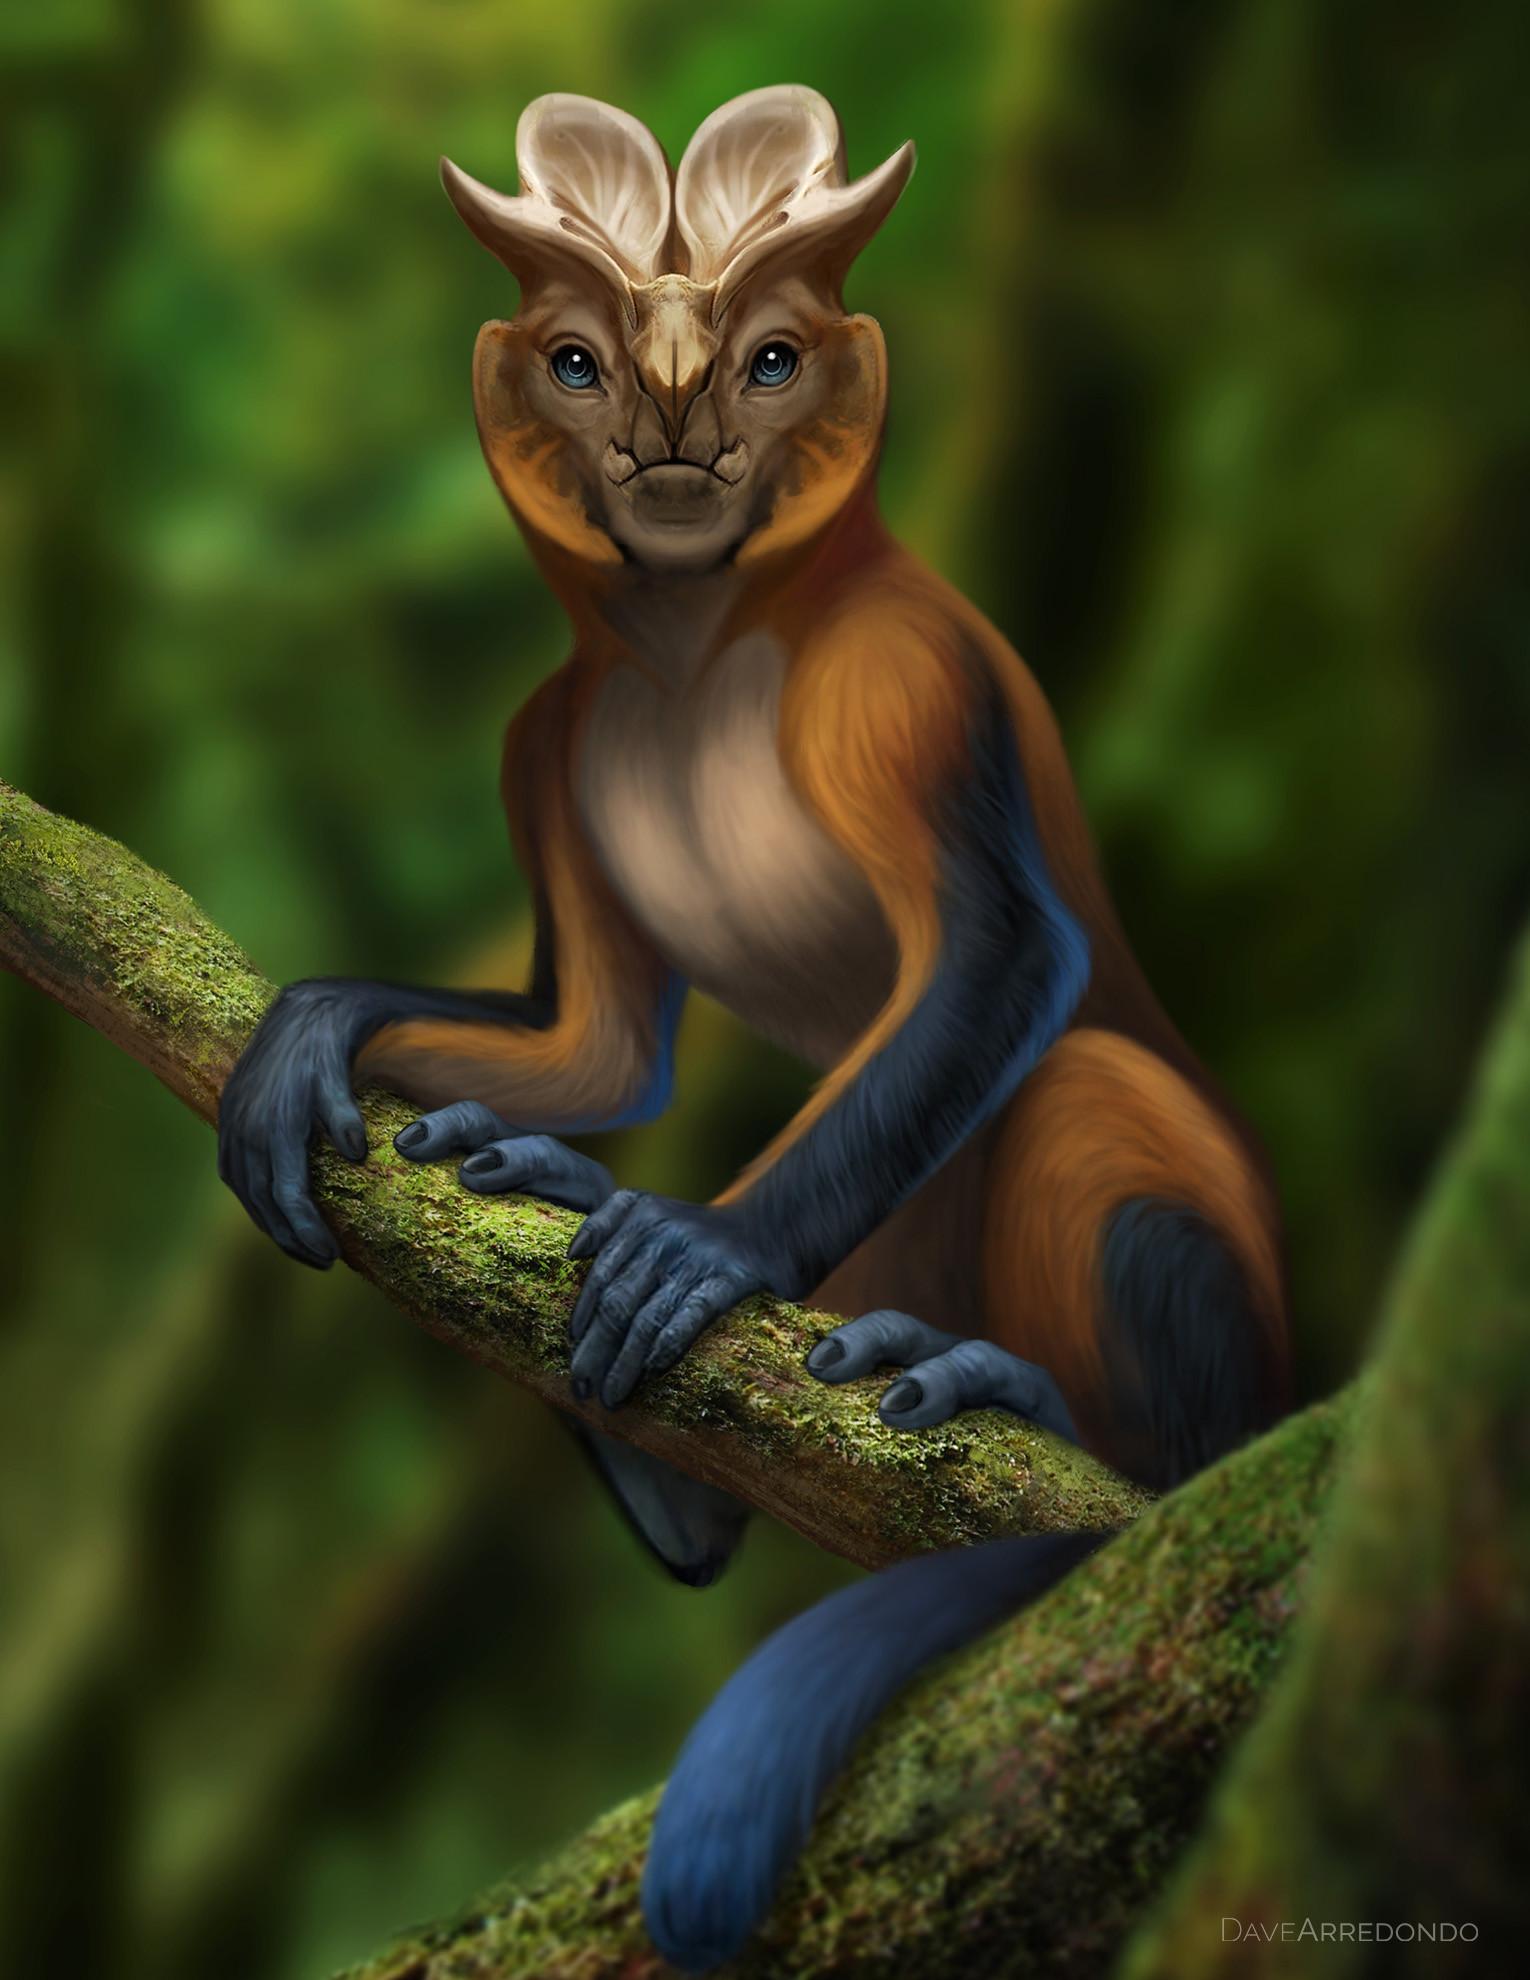 Dave arredondo zama monkey 02